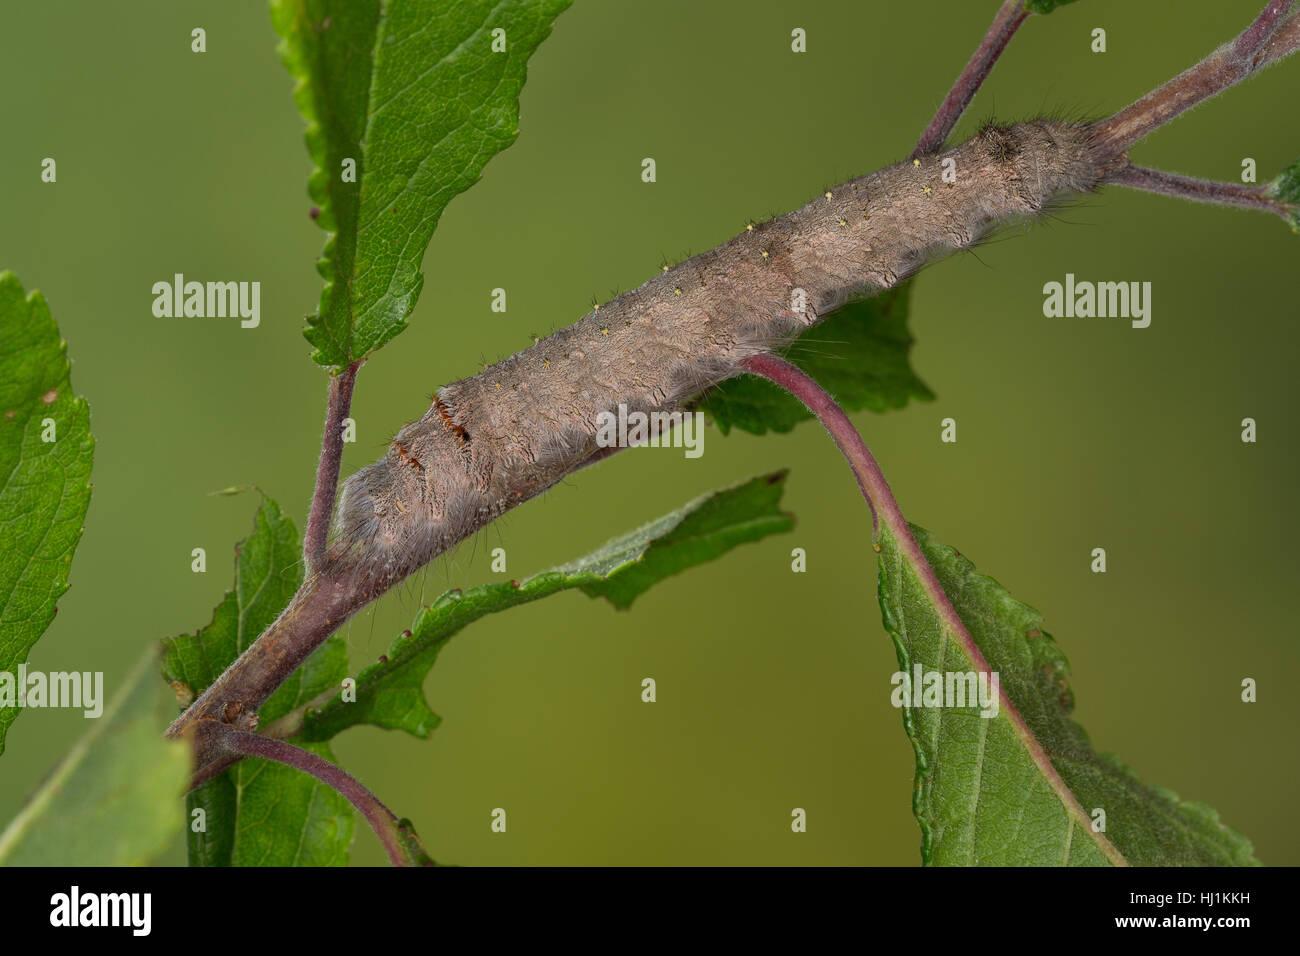 Streblote panda, Raupe, Megasoma repanda, Blueberry Lappet, blueberry lappet moth, caterpillar, Mégasome recourbé, - Stock Image